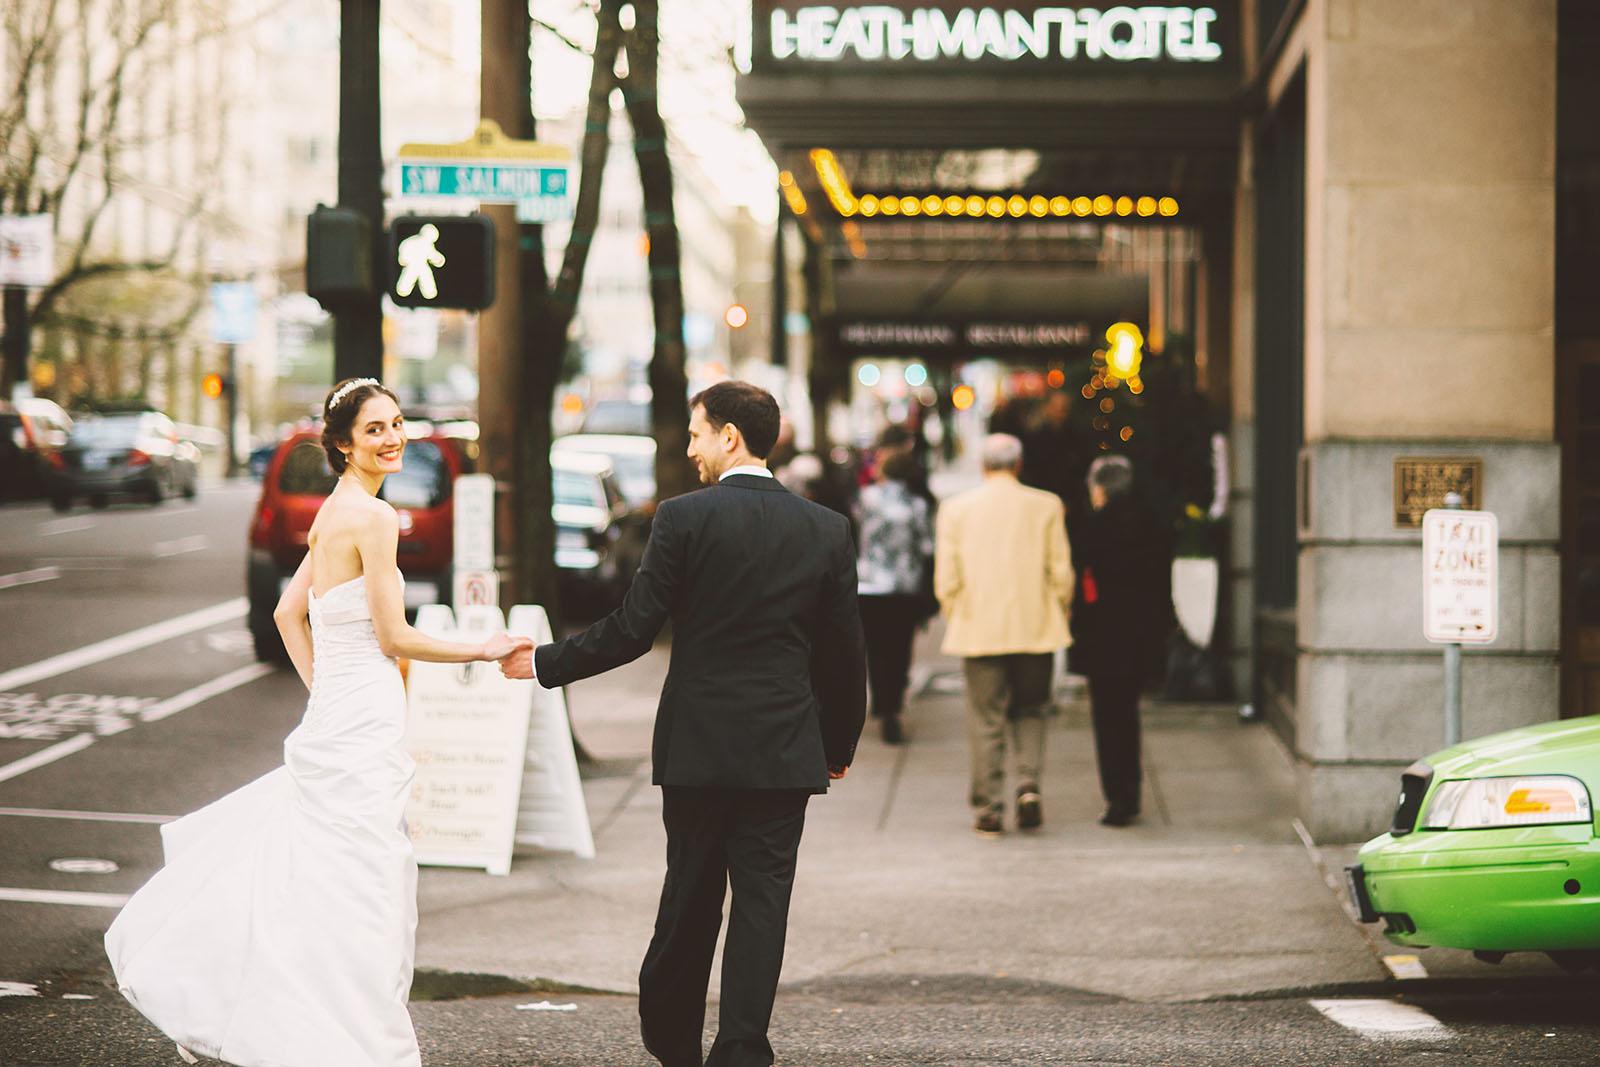 Couple entering the Heathman Hotel on their wedding night | Old Church Wedding Photos